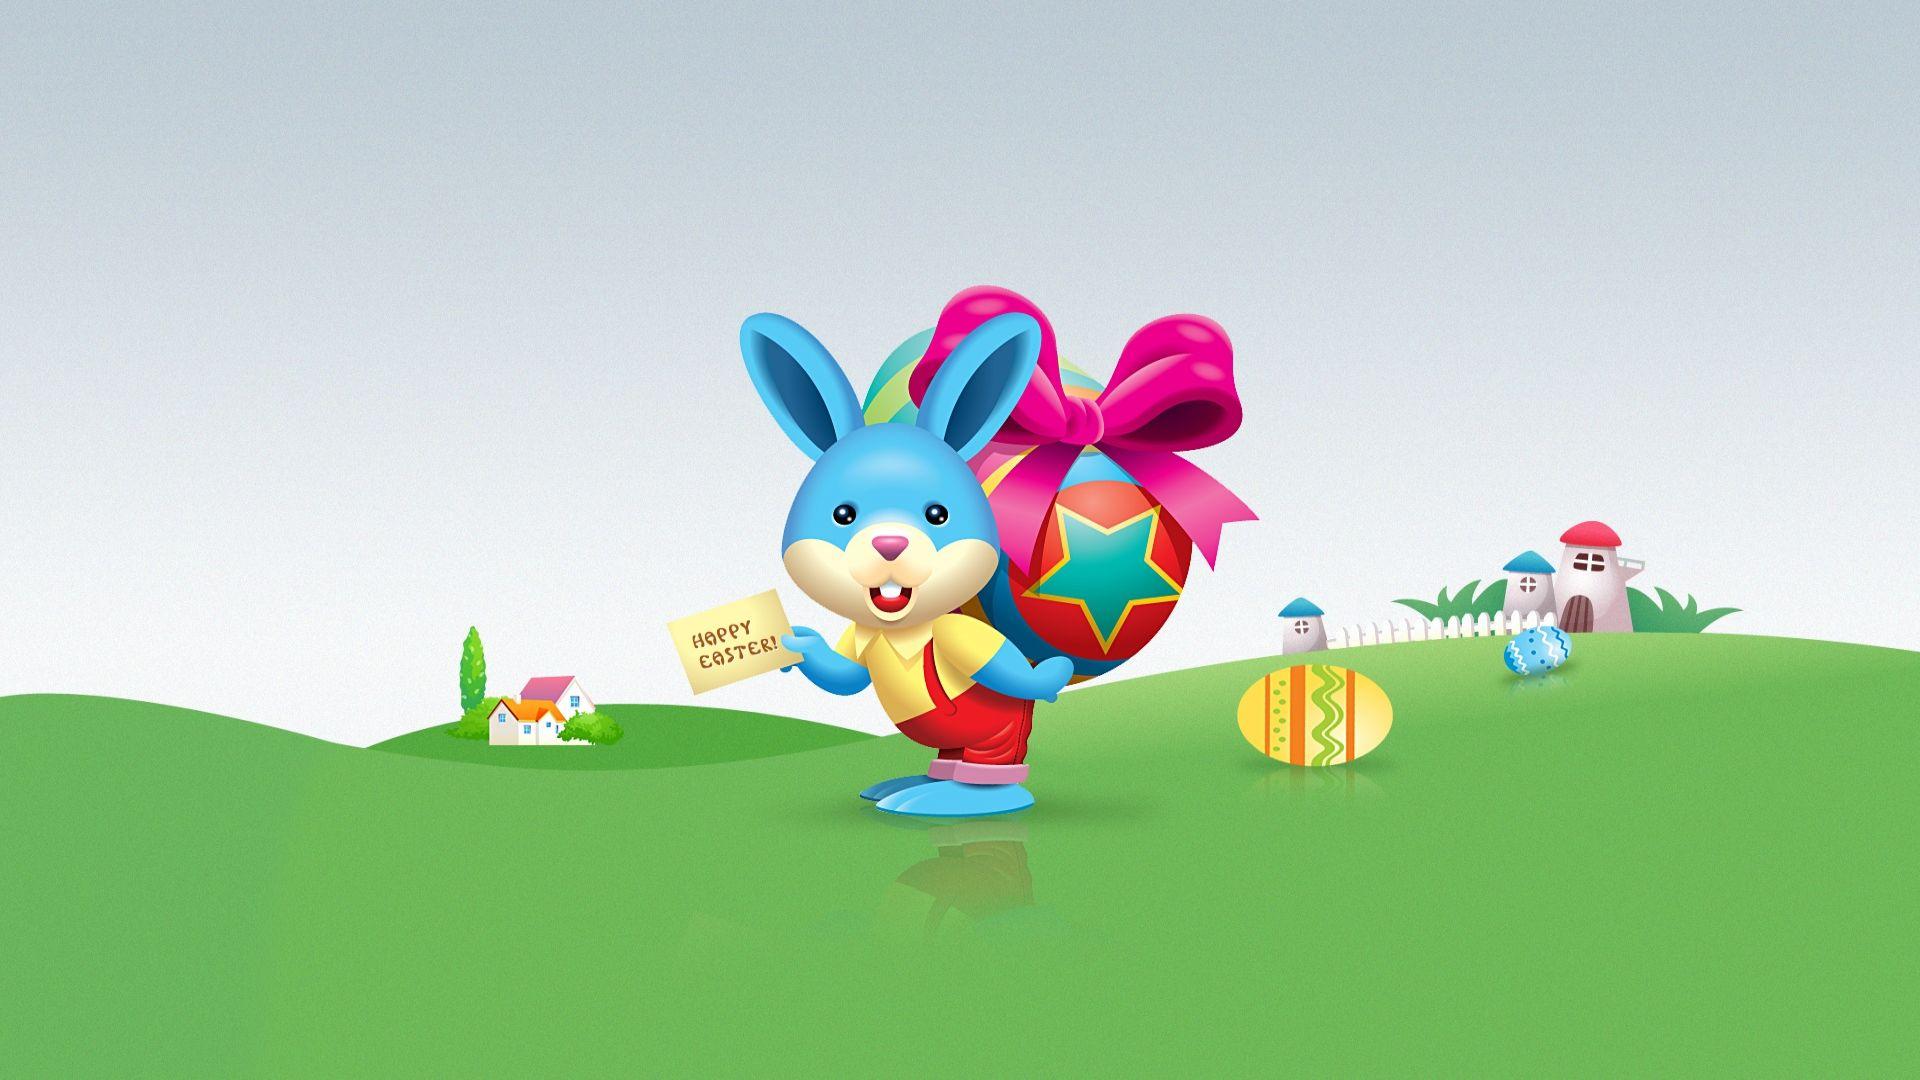 48 Cartoon HD High Quality Wallpapers, 100% Quality HD Desktop